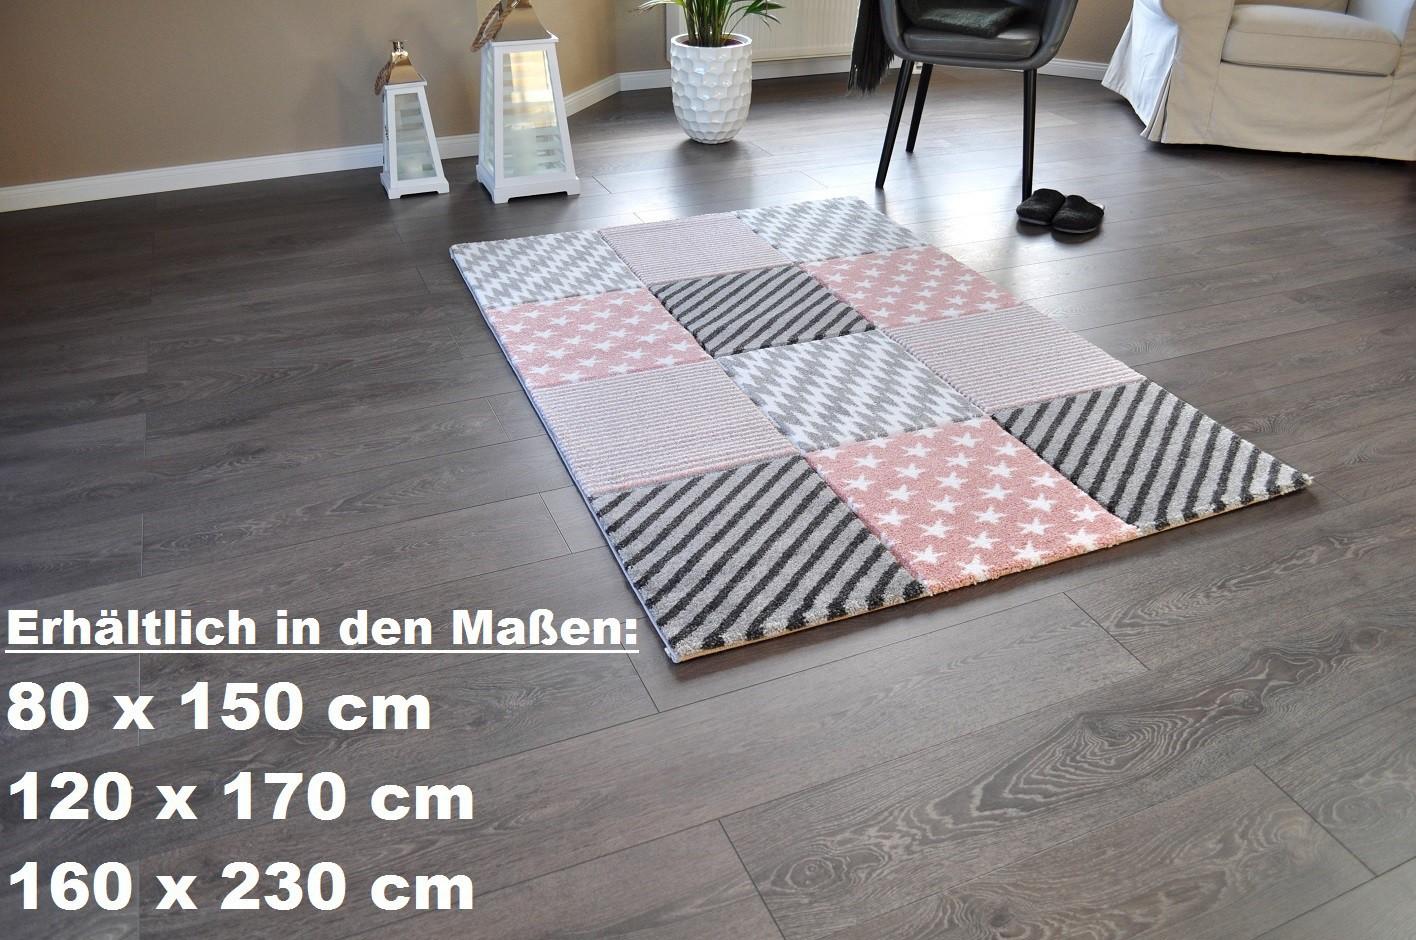 hochwertiger design teppich relief tf 21 rosa grau wei sterne 160 x 230 teppiche design trend. Black Bedroom Furniture Sets. Home Design Ideas